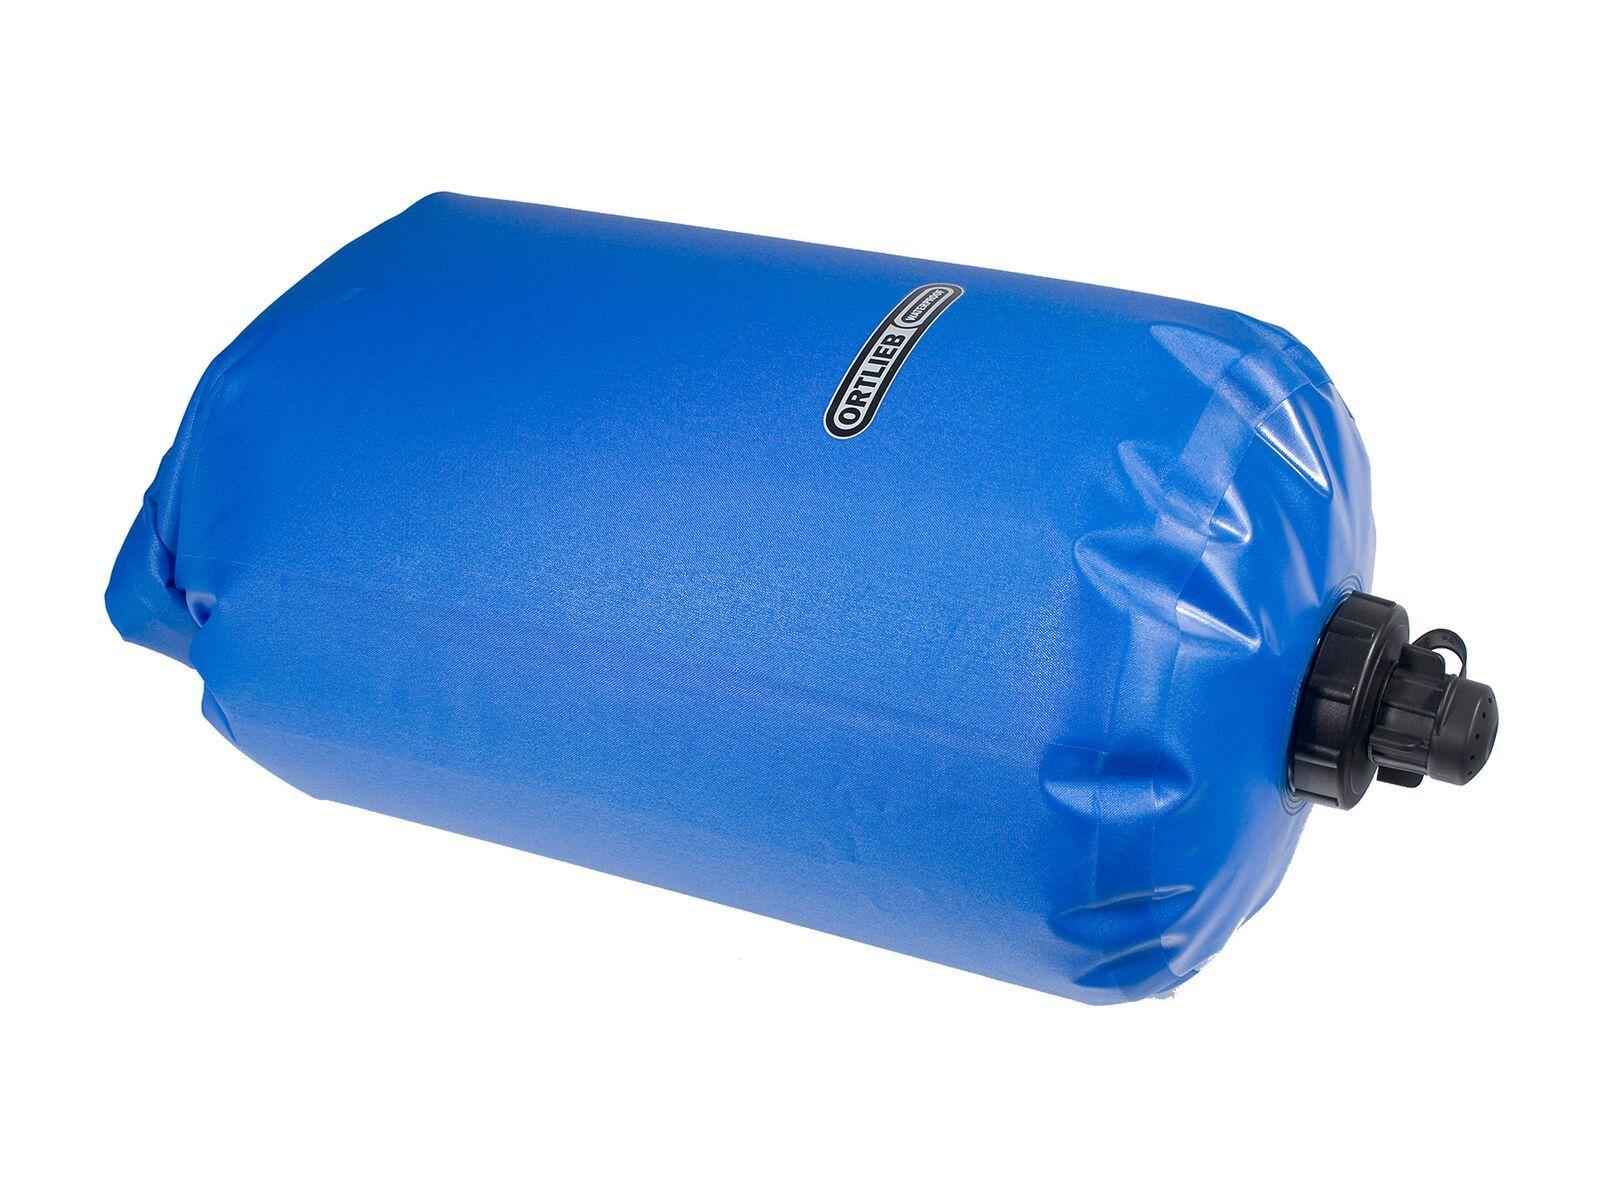 Ortlieb Water-Sack 10 L, blue - Wassersack N48